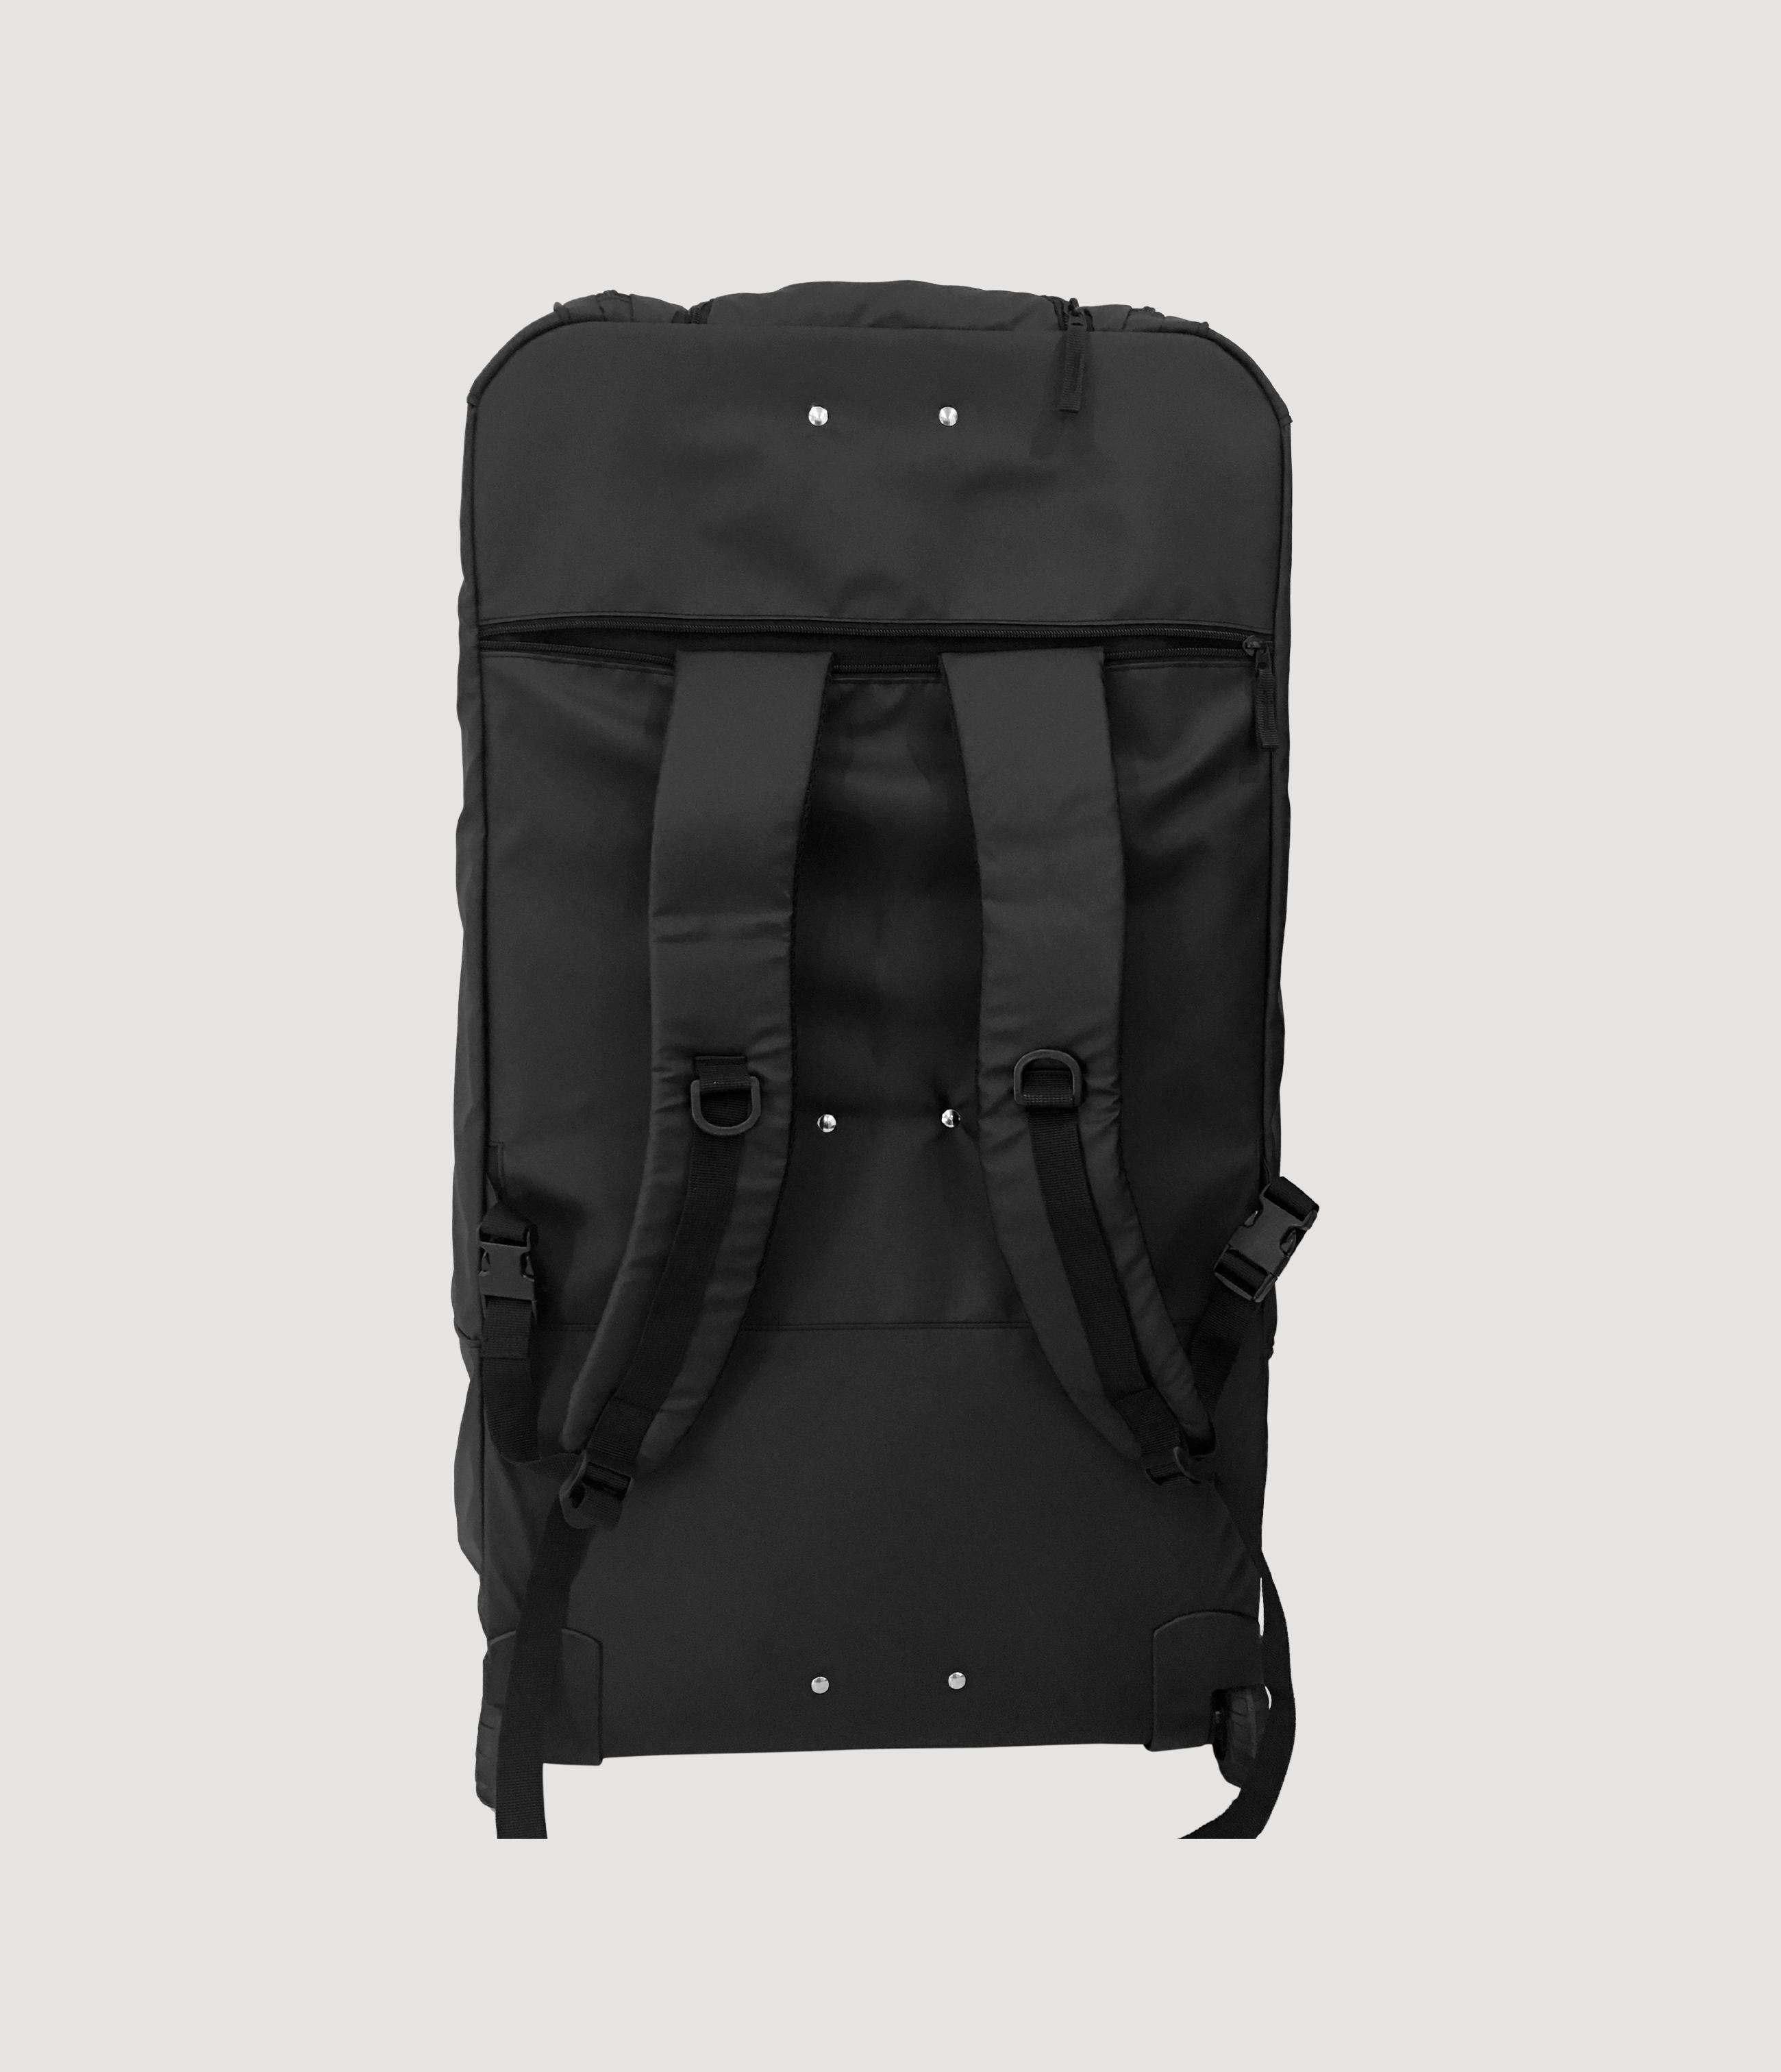 OX3 Pro Wheelbag Back